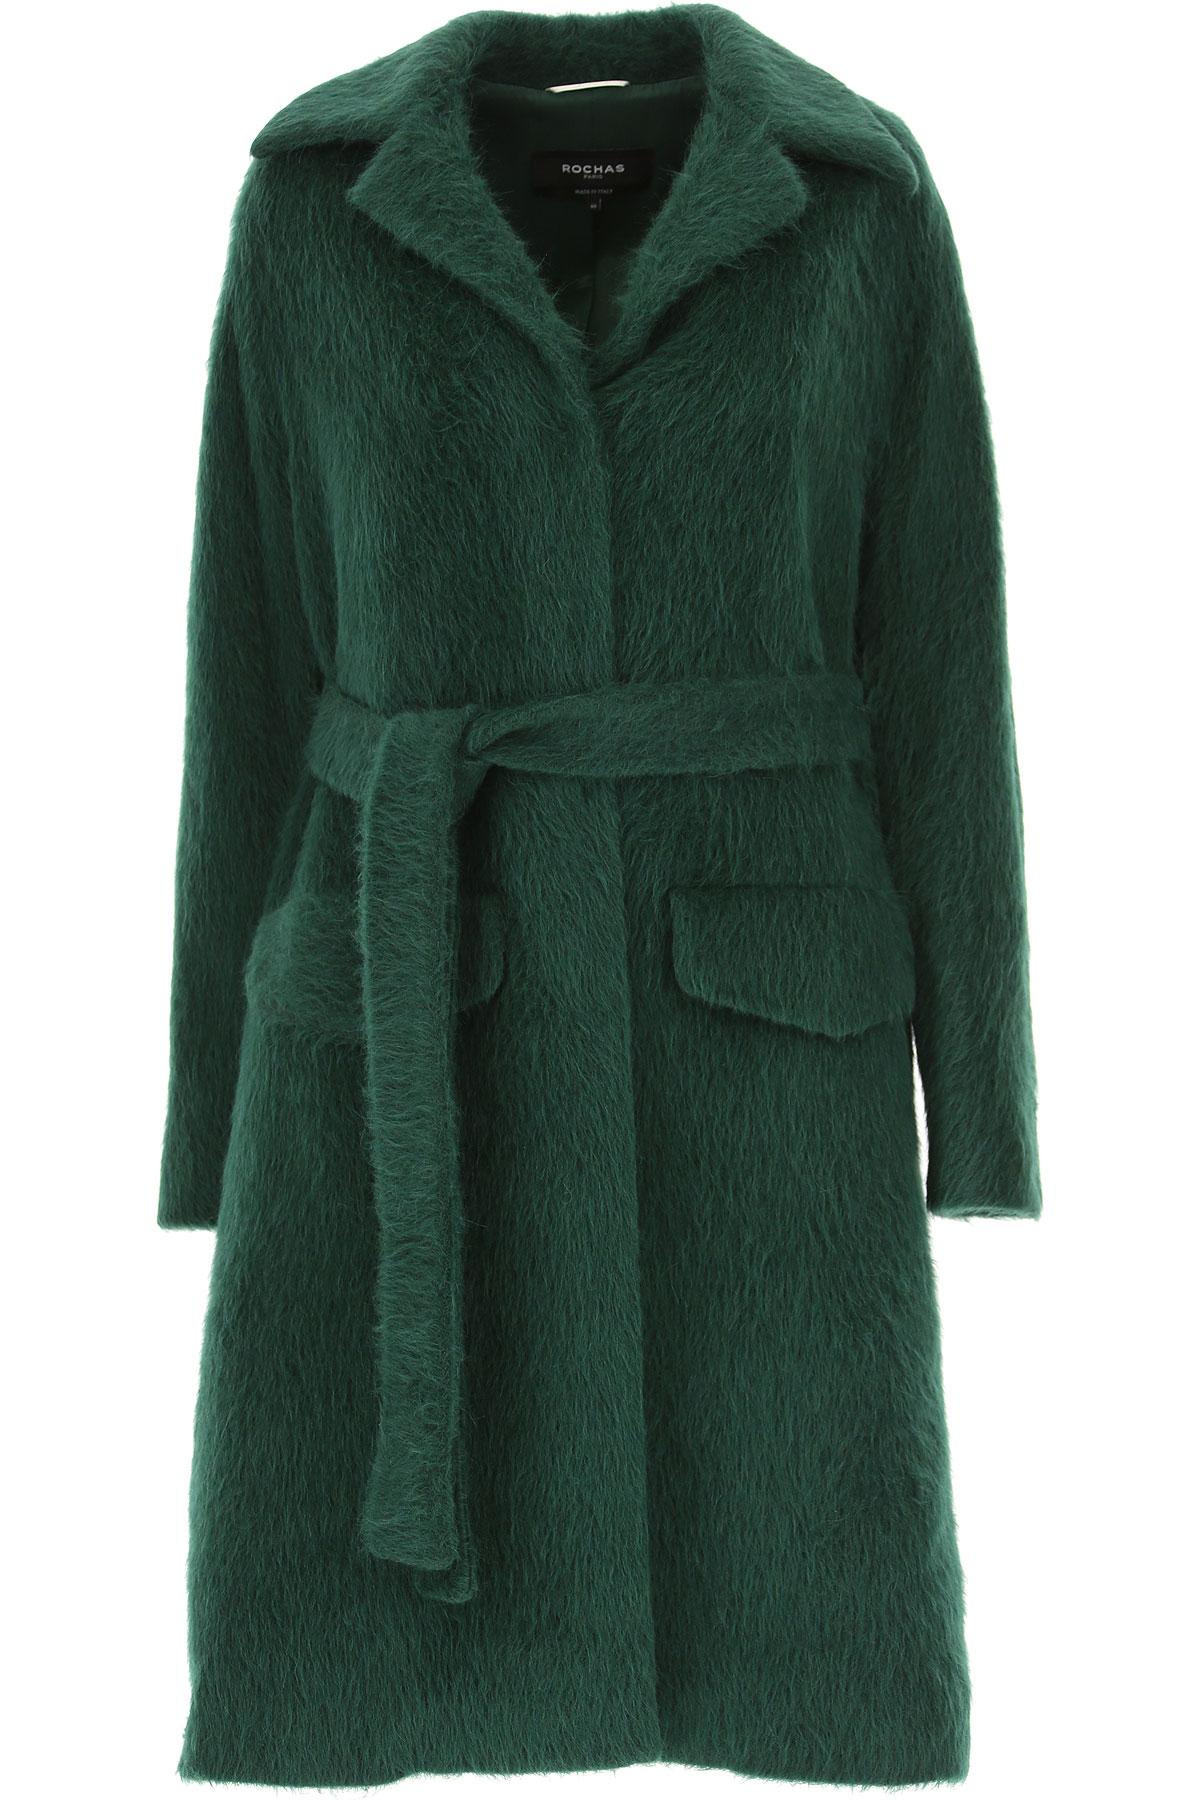 Image of Rochas Women\'s Coat, Bottle Green, alpaca, 2017, UK 8 - US 6 - EU 40 UK 10 - US 8 - EU 42